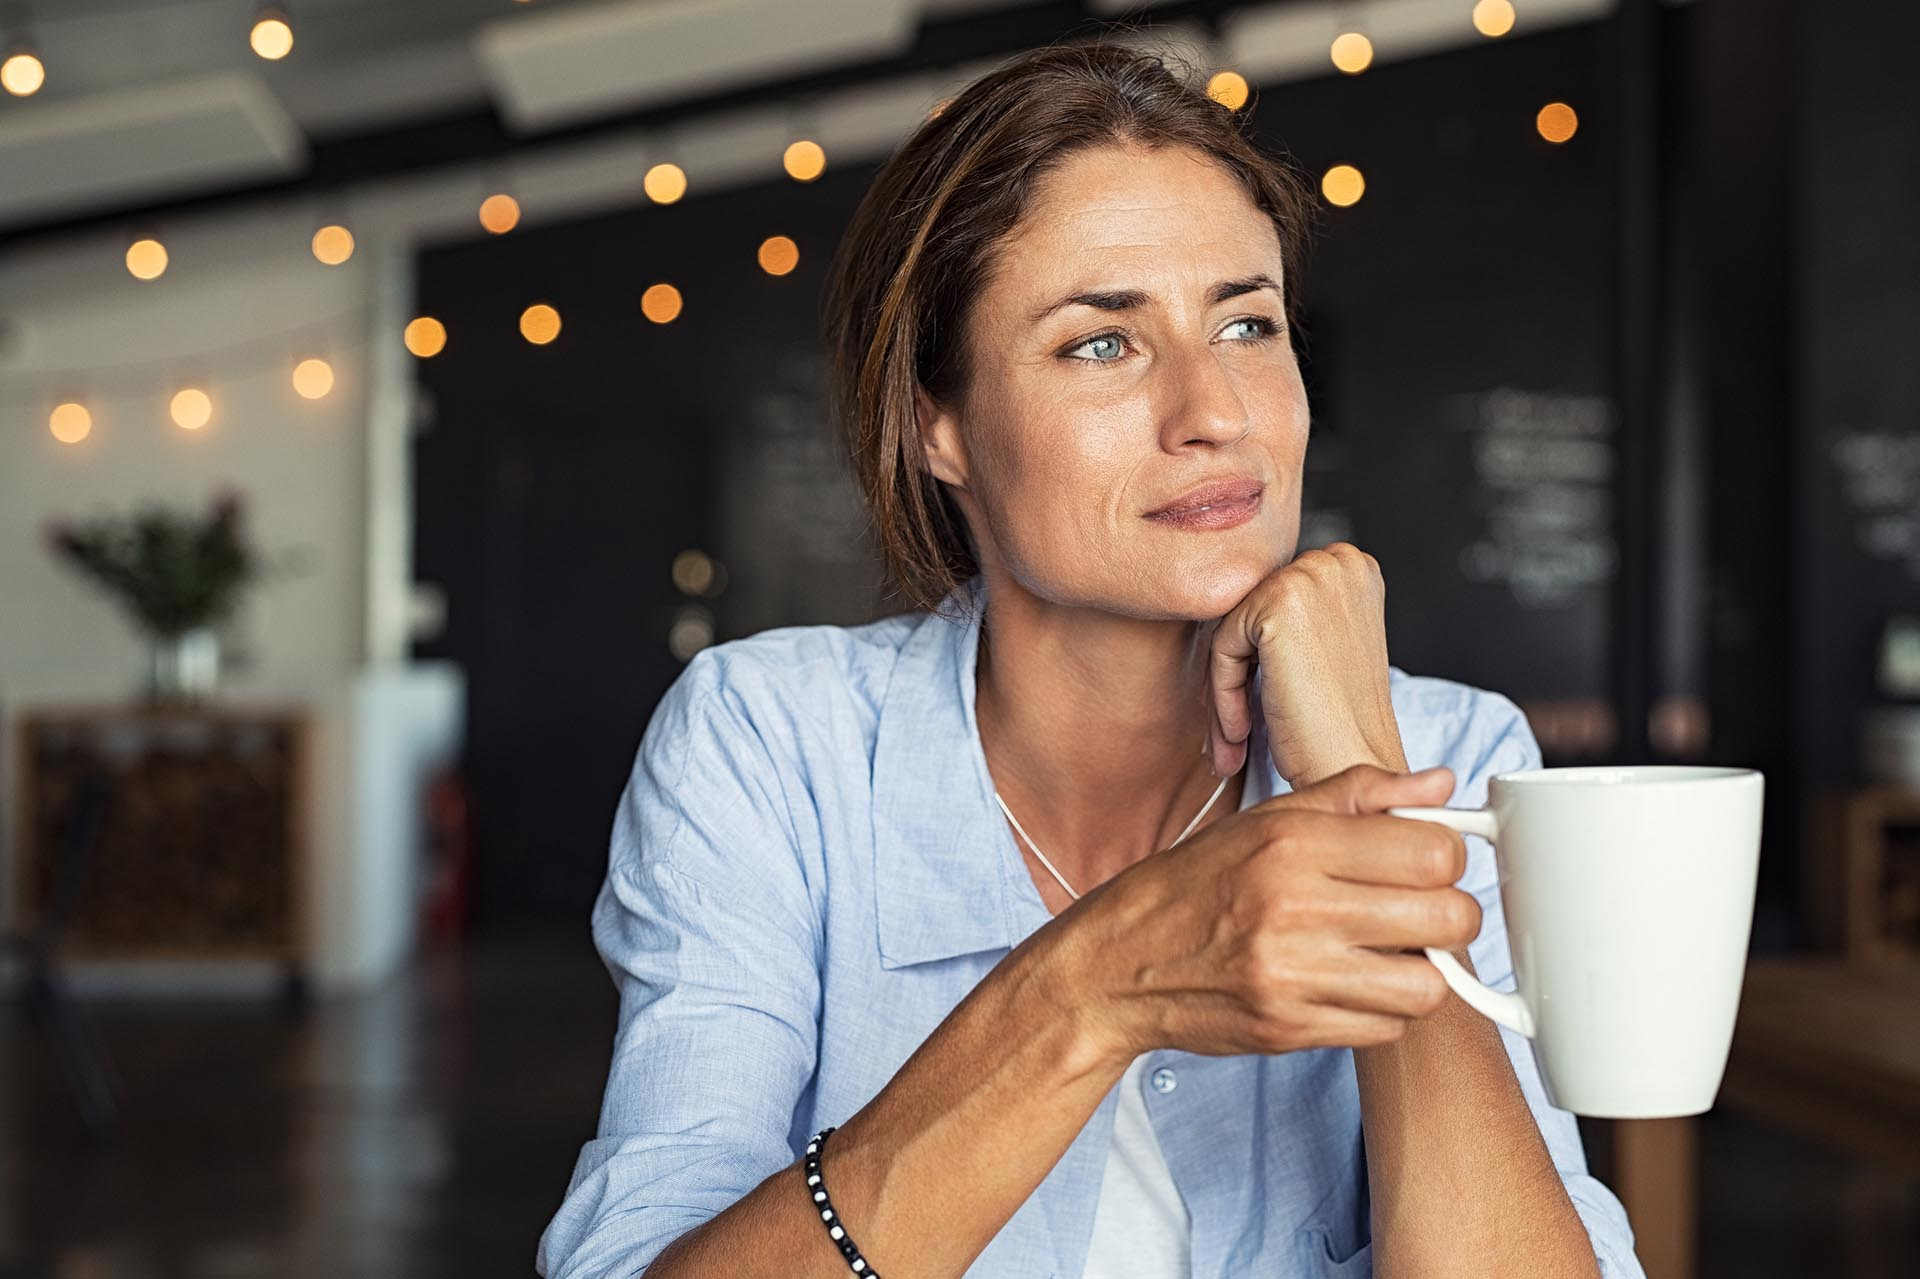 Aging woman holding coffee mug